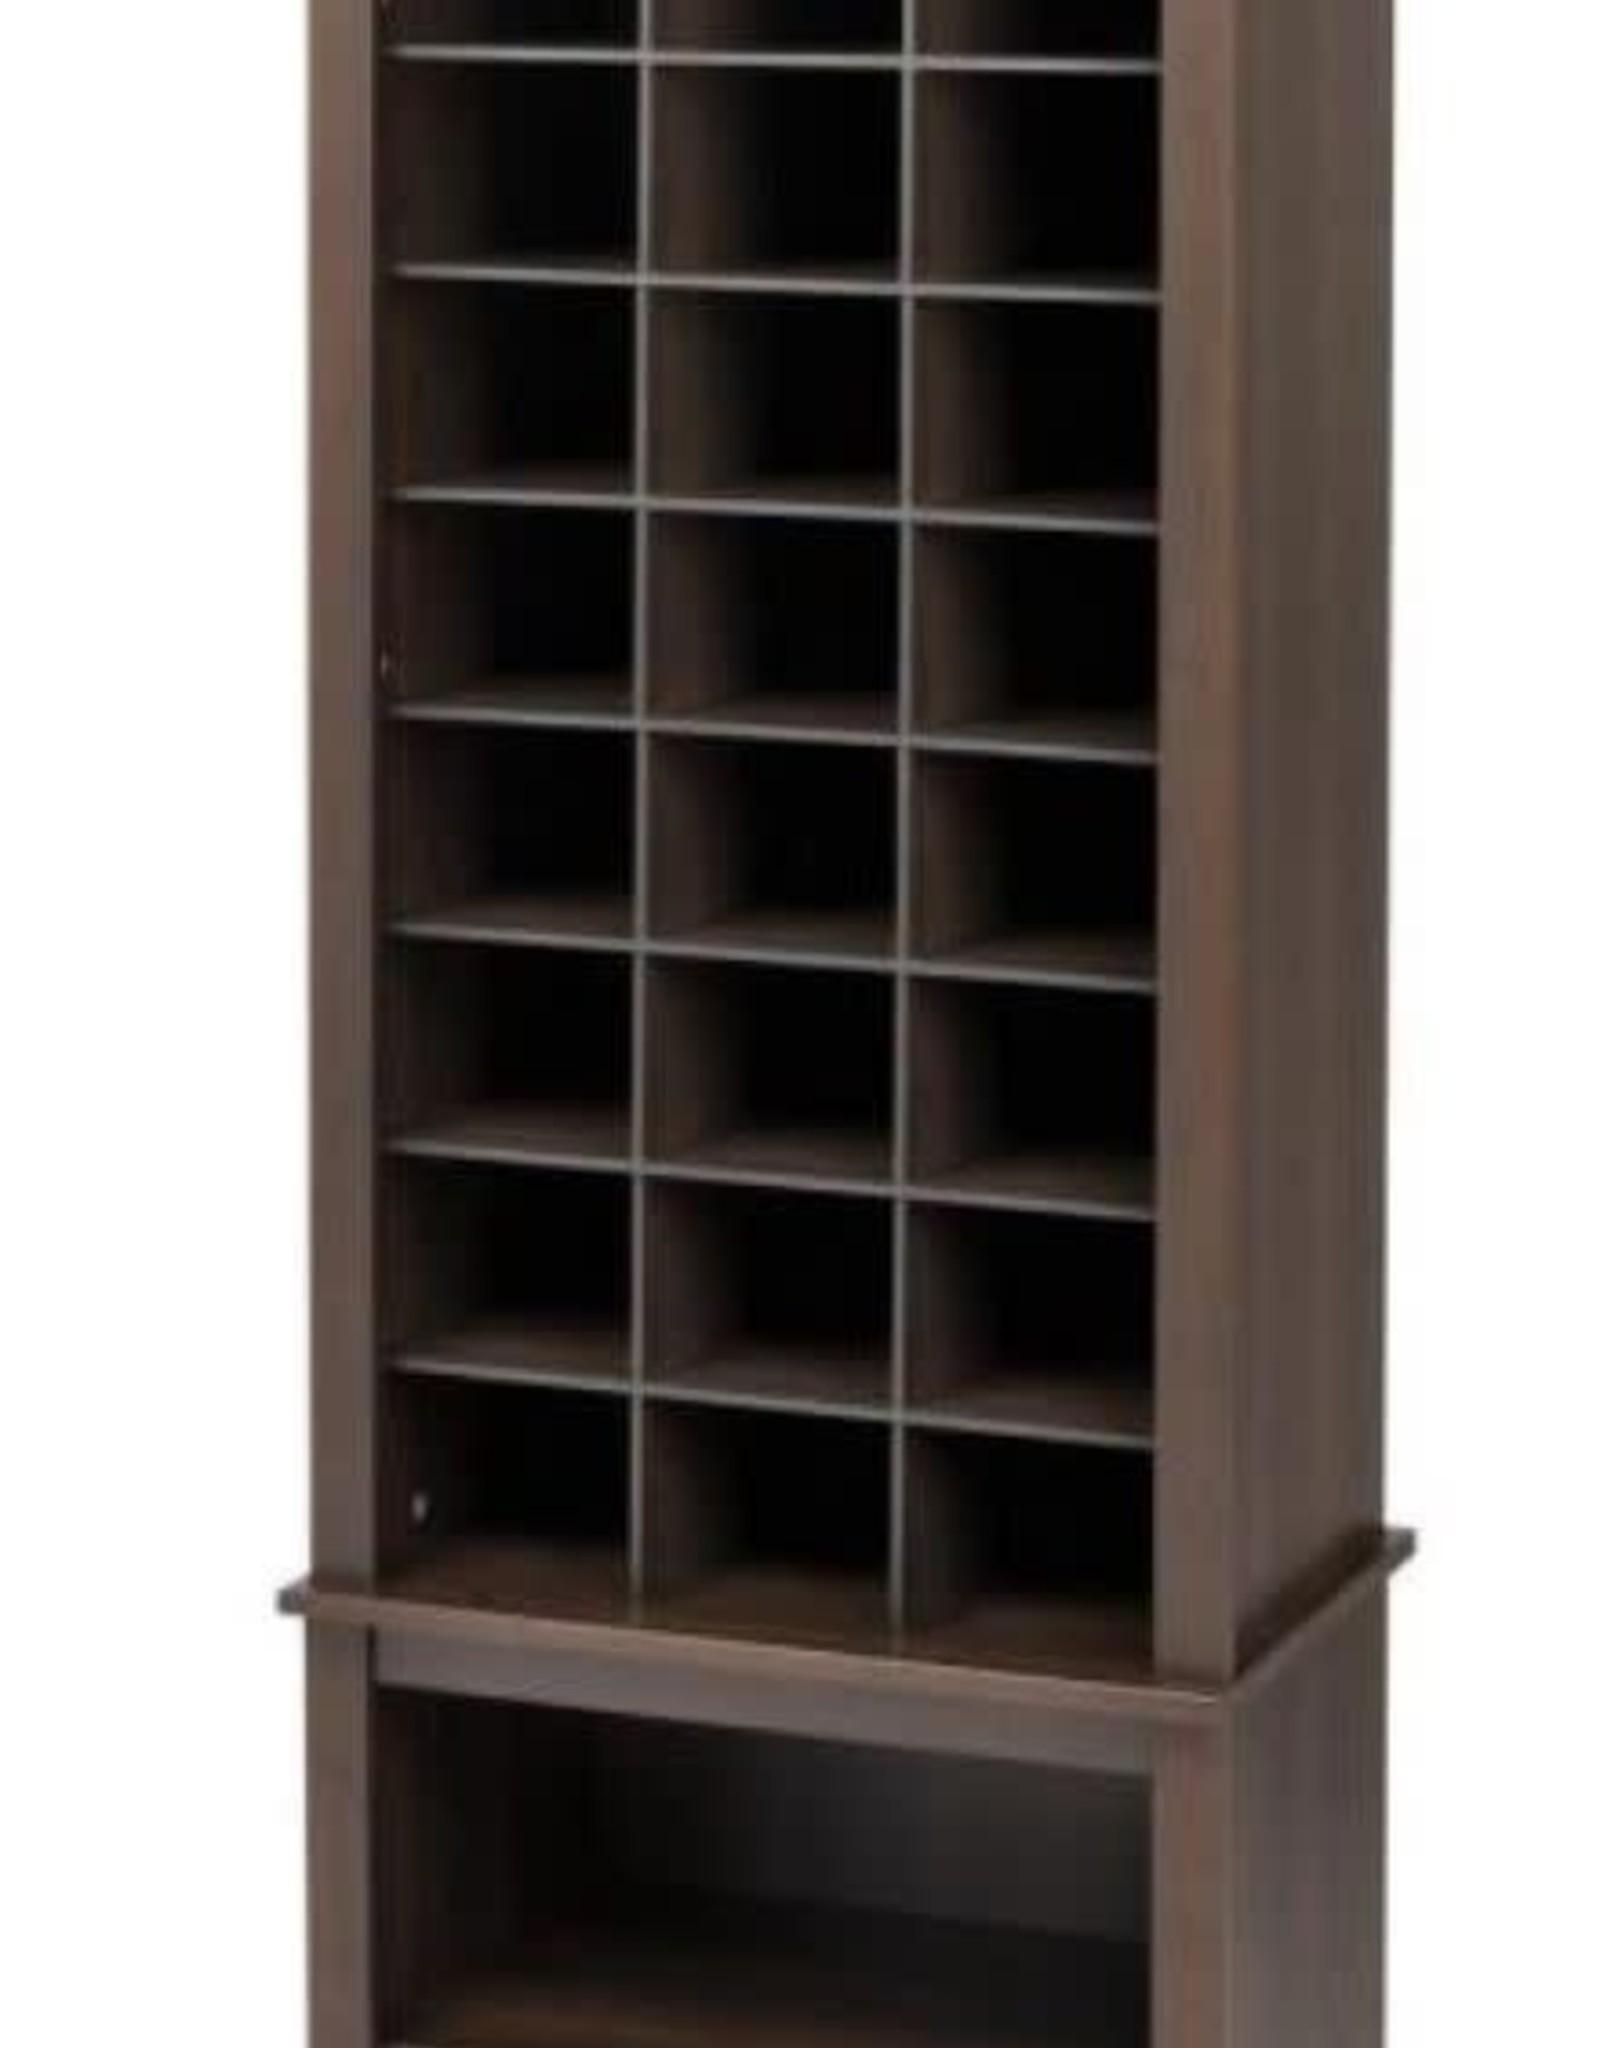 Prepac 24.75 in. x 61.25 in. Tall 24-Cube Cabinet Tower Organizer in Espresso